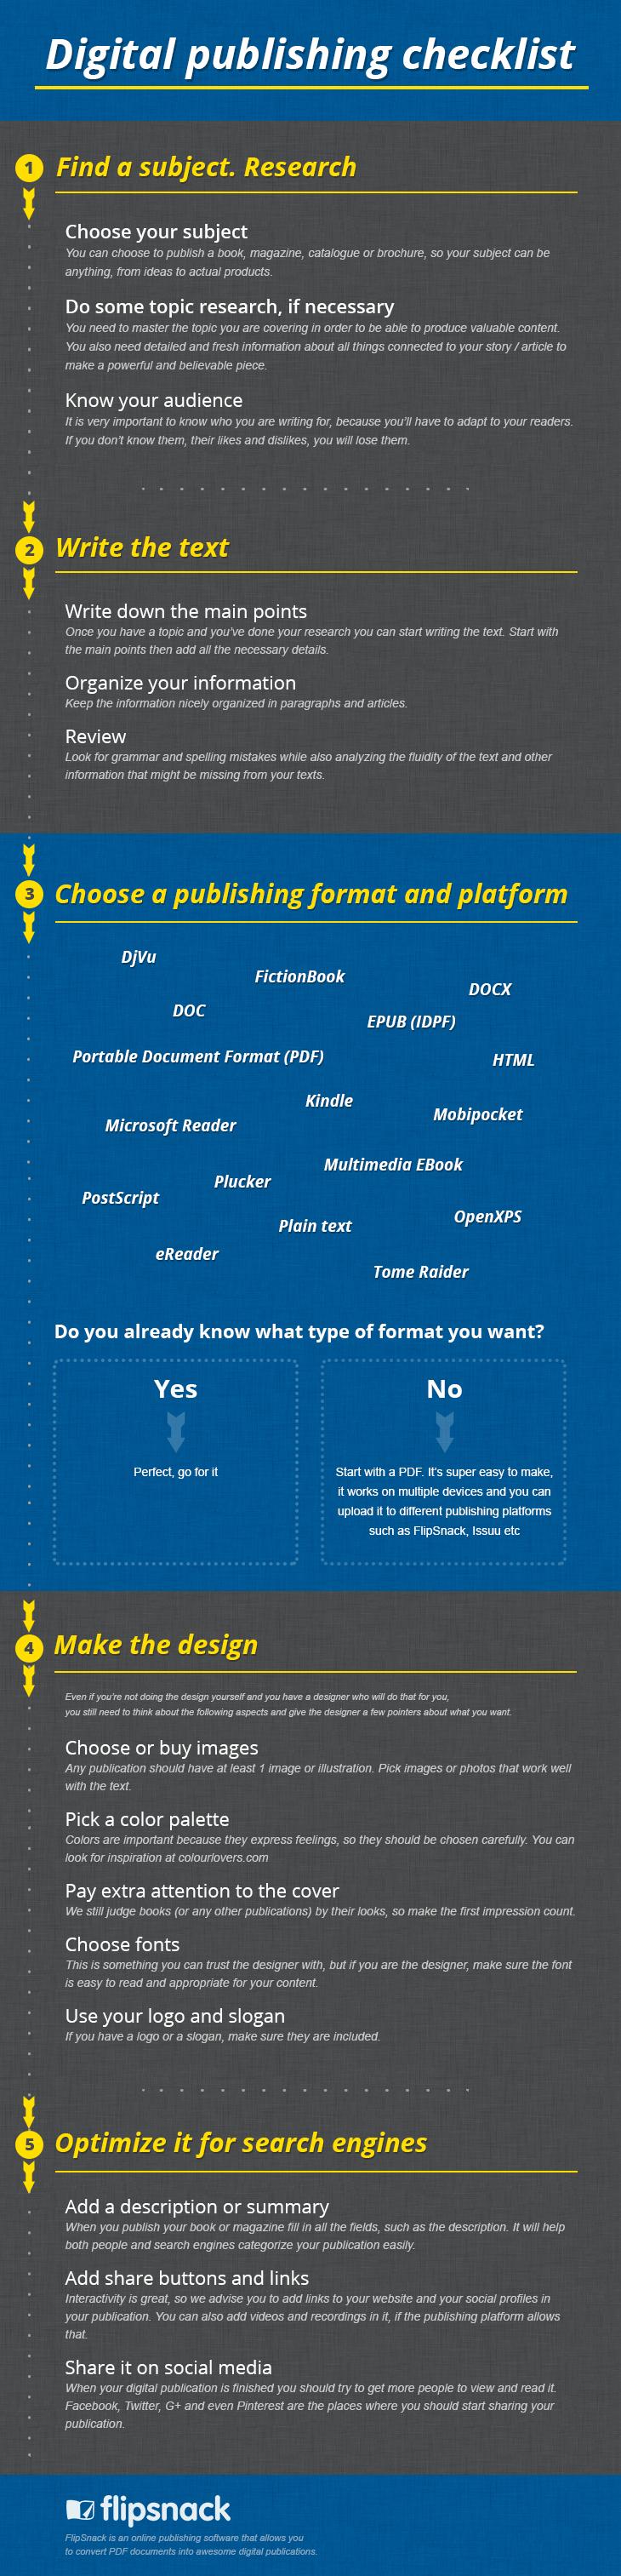 Digital publishing infographic